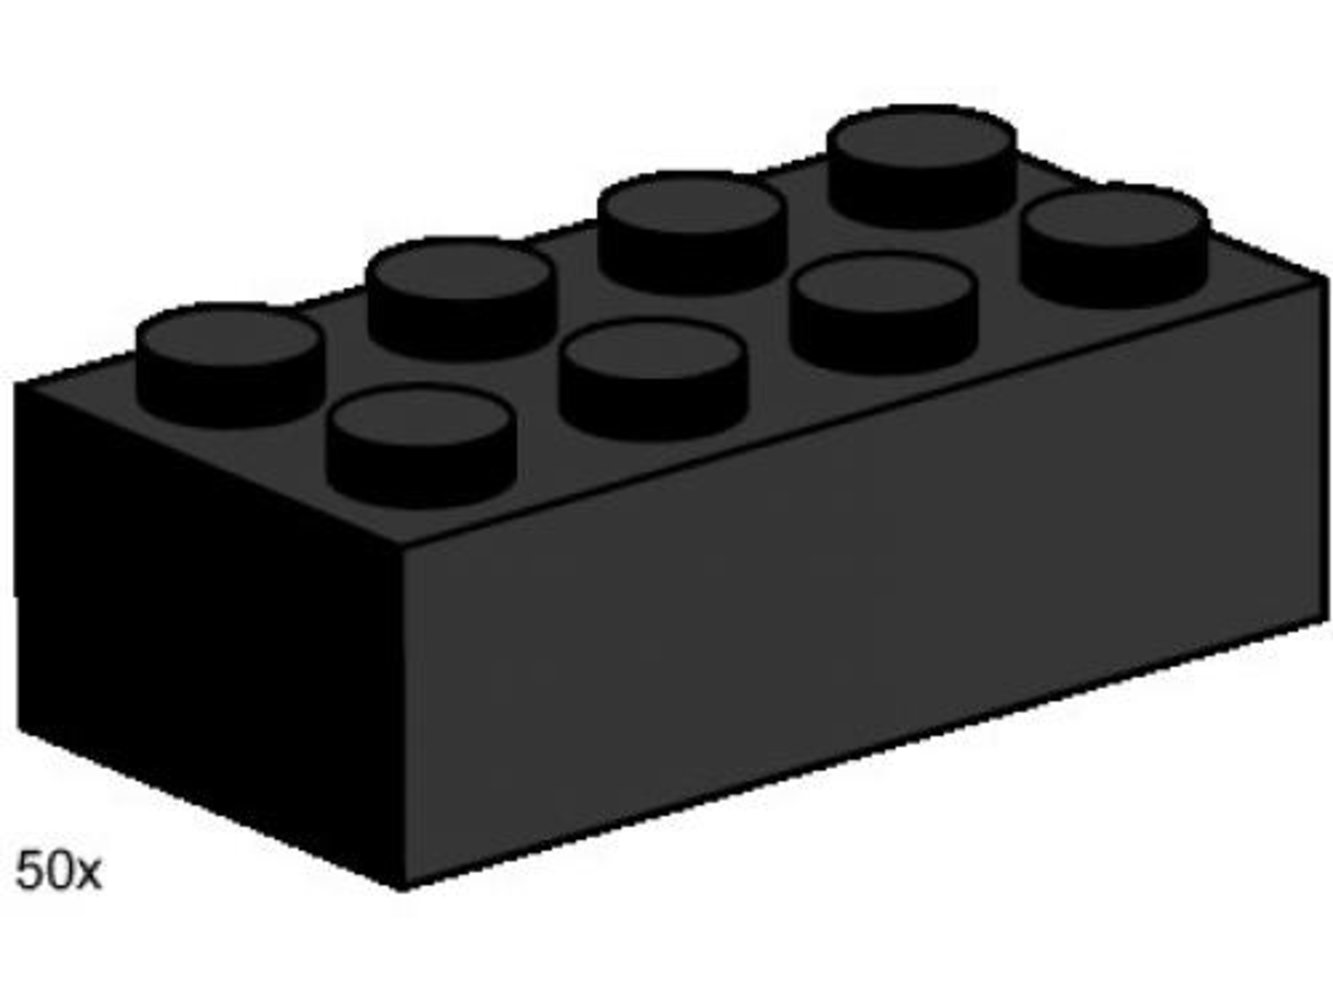 2 x 4 Black Bricks